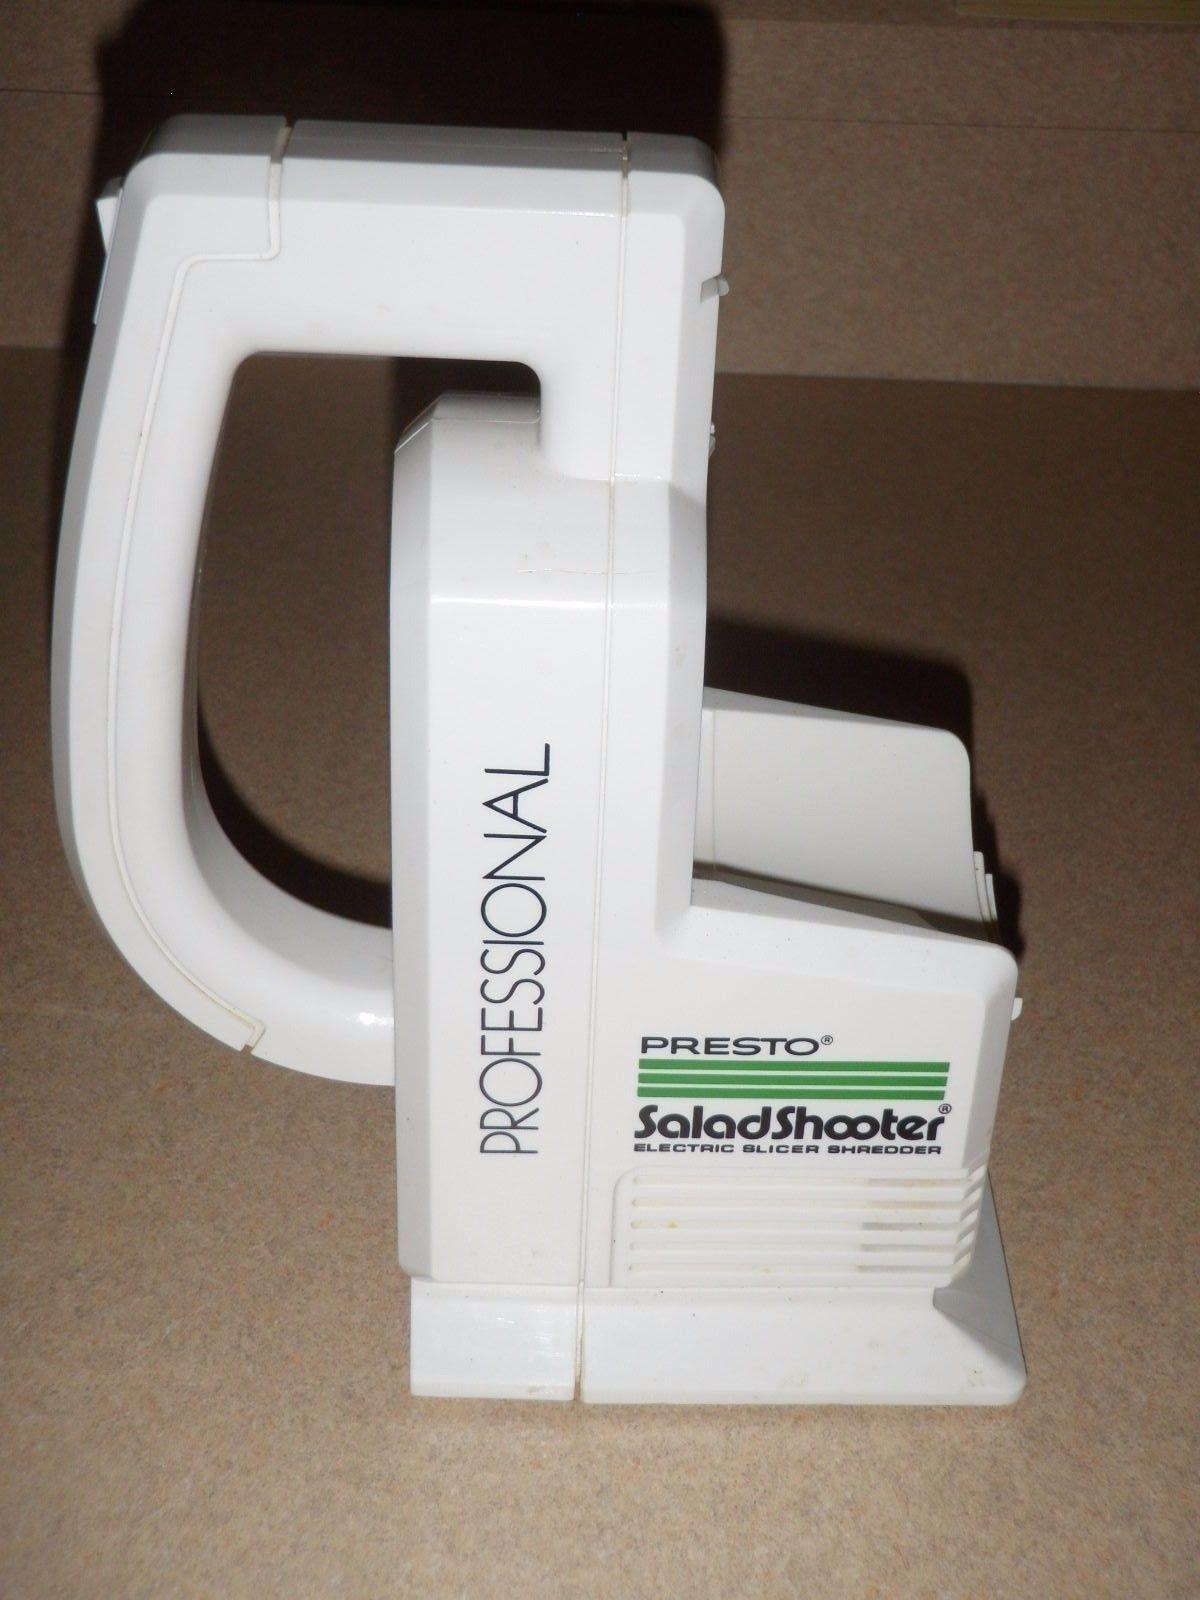 Presto Professional Salad Shooter Base Model 0297001 ( Base Only ) Part - $15.87